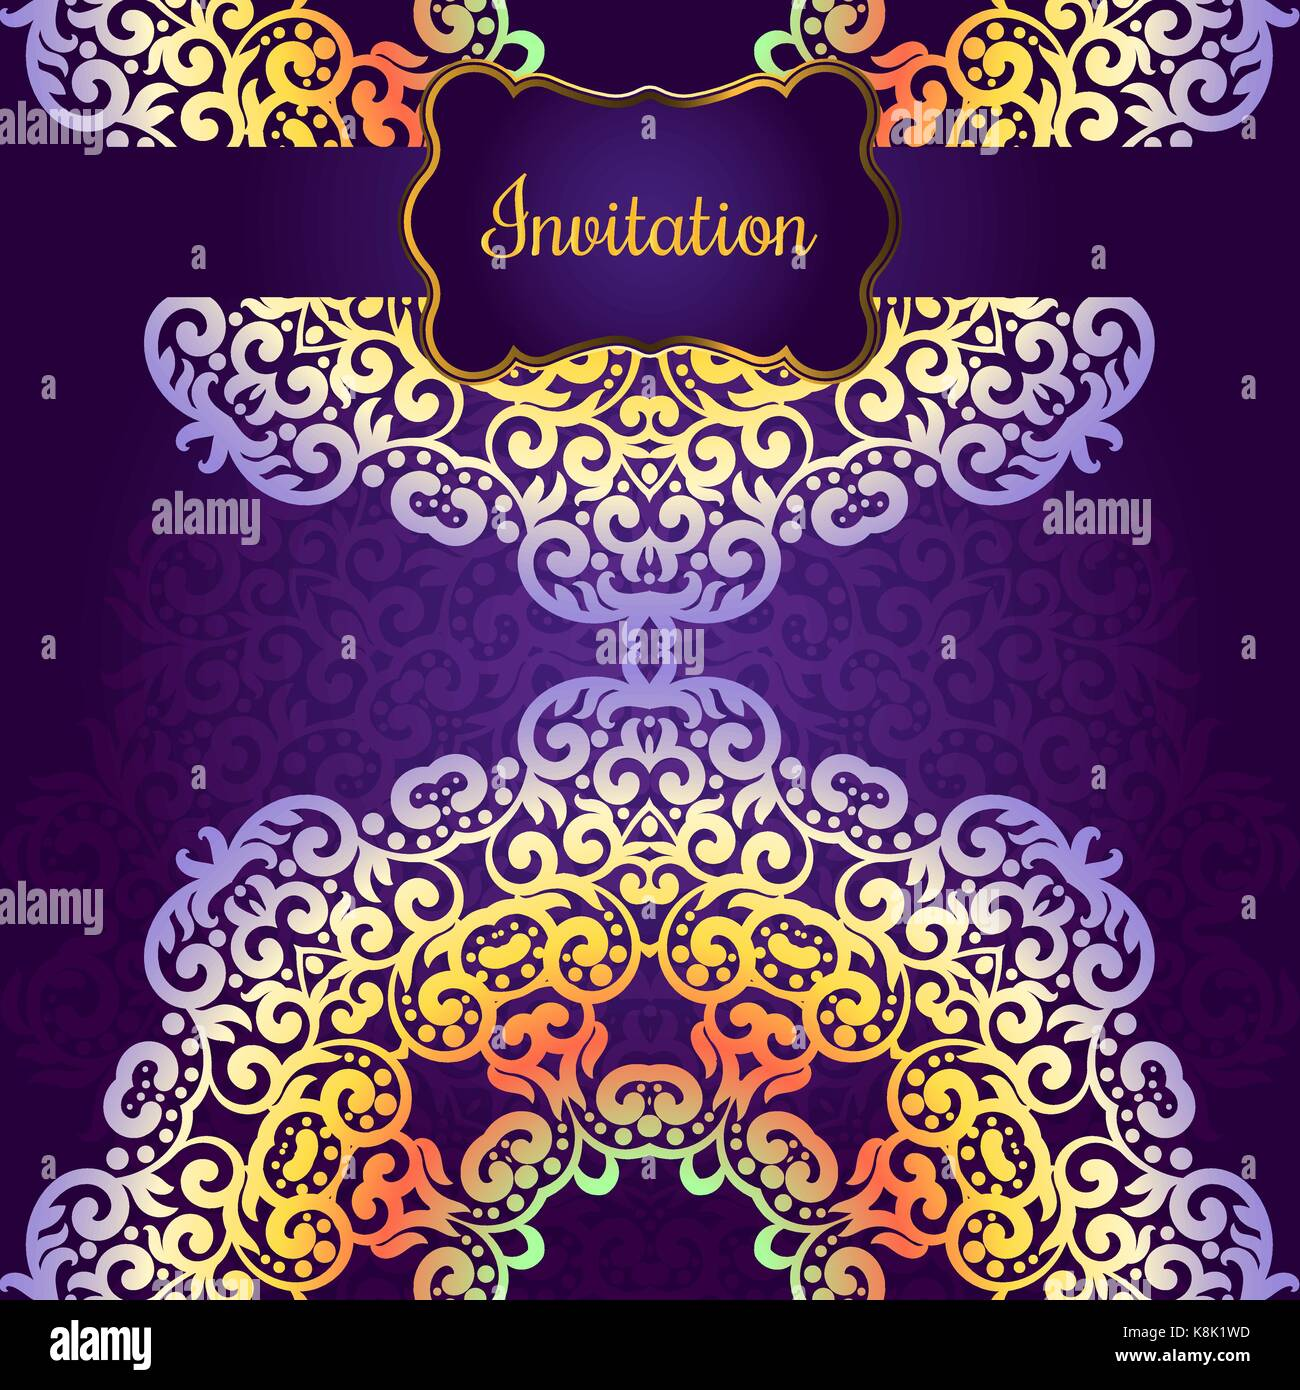 Wedding invitation delicate swirl mandala pattern vector stock wedding invitation delicate swirl mandala pattern vector background card or invitation vintage decorative elements soft colorful background isla junglespirit Image collections